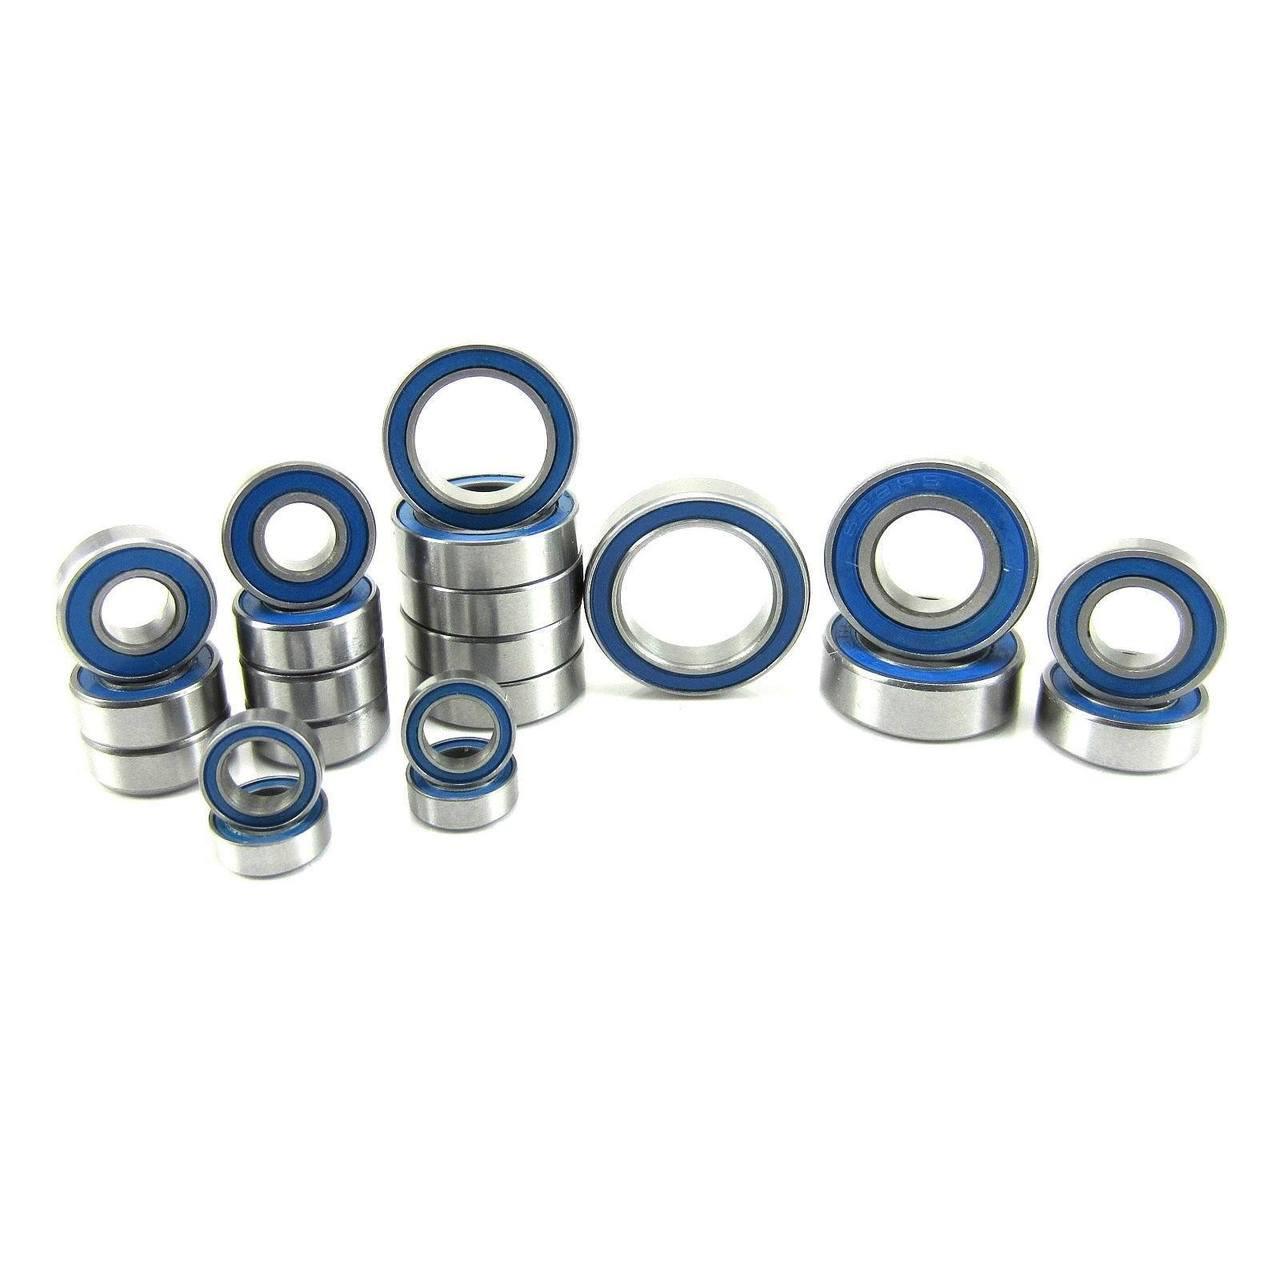 TRB RC Precision Ball Bearing Kit Blue (21) Traxxas Rustler 4x4 VXL